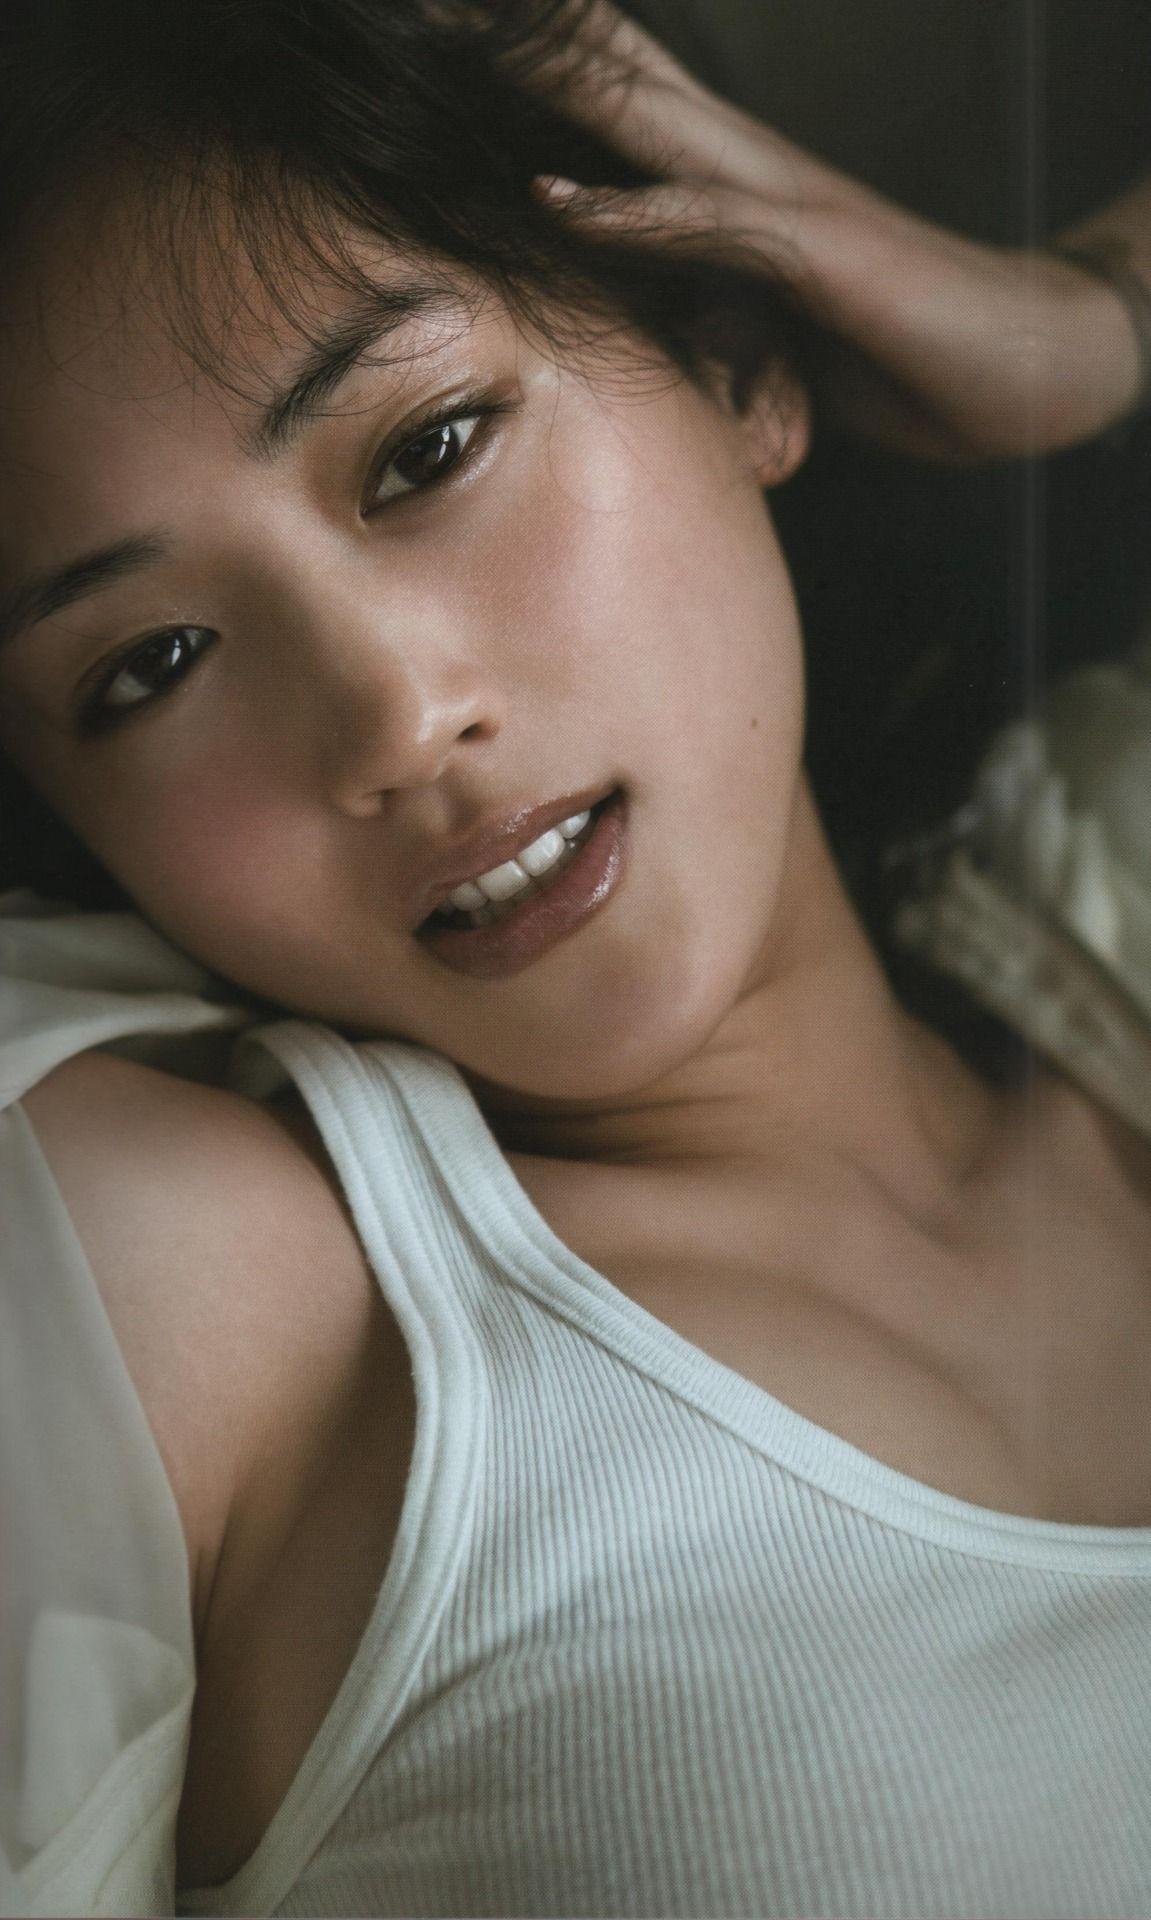 Erotica Butt Linda Hart  nudes (95 photo), Instagram, lingerie